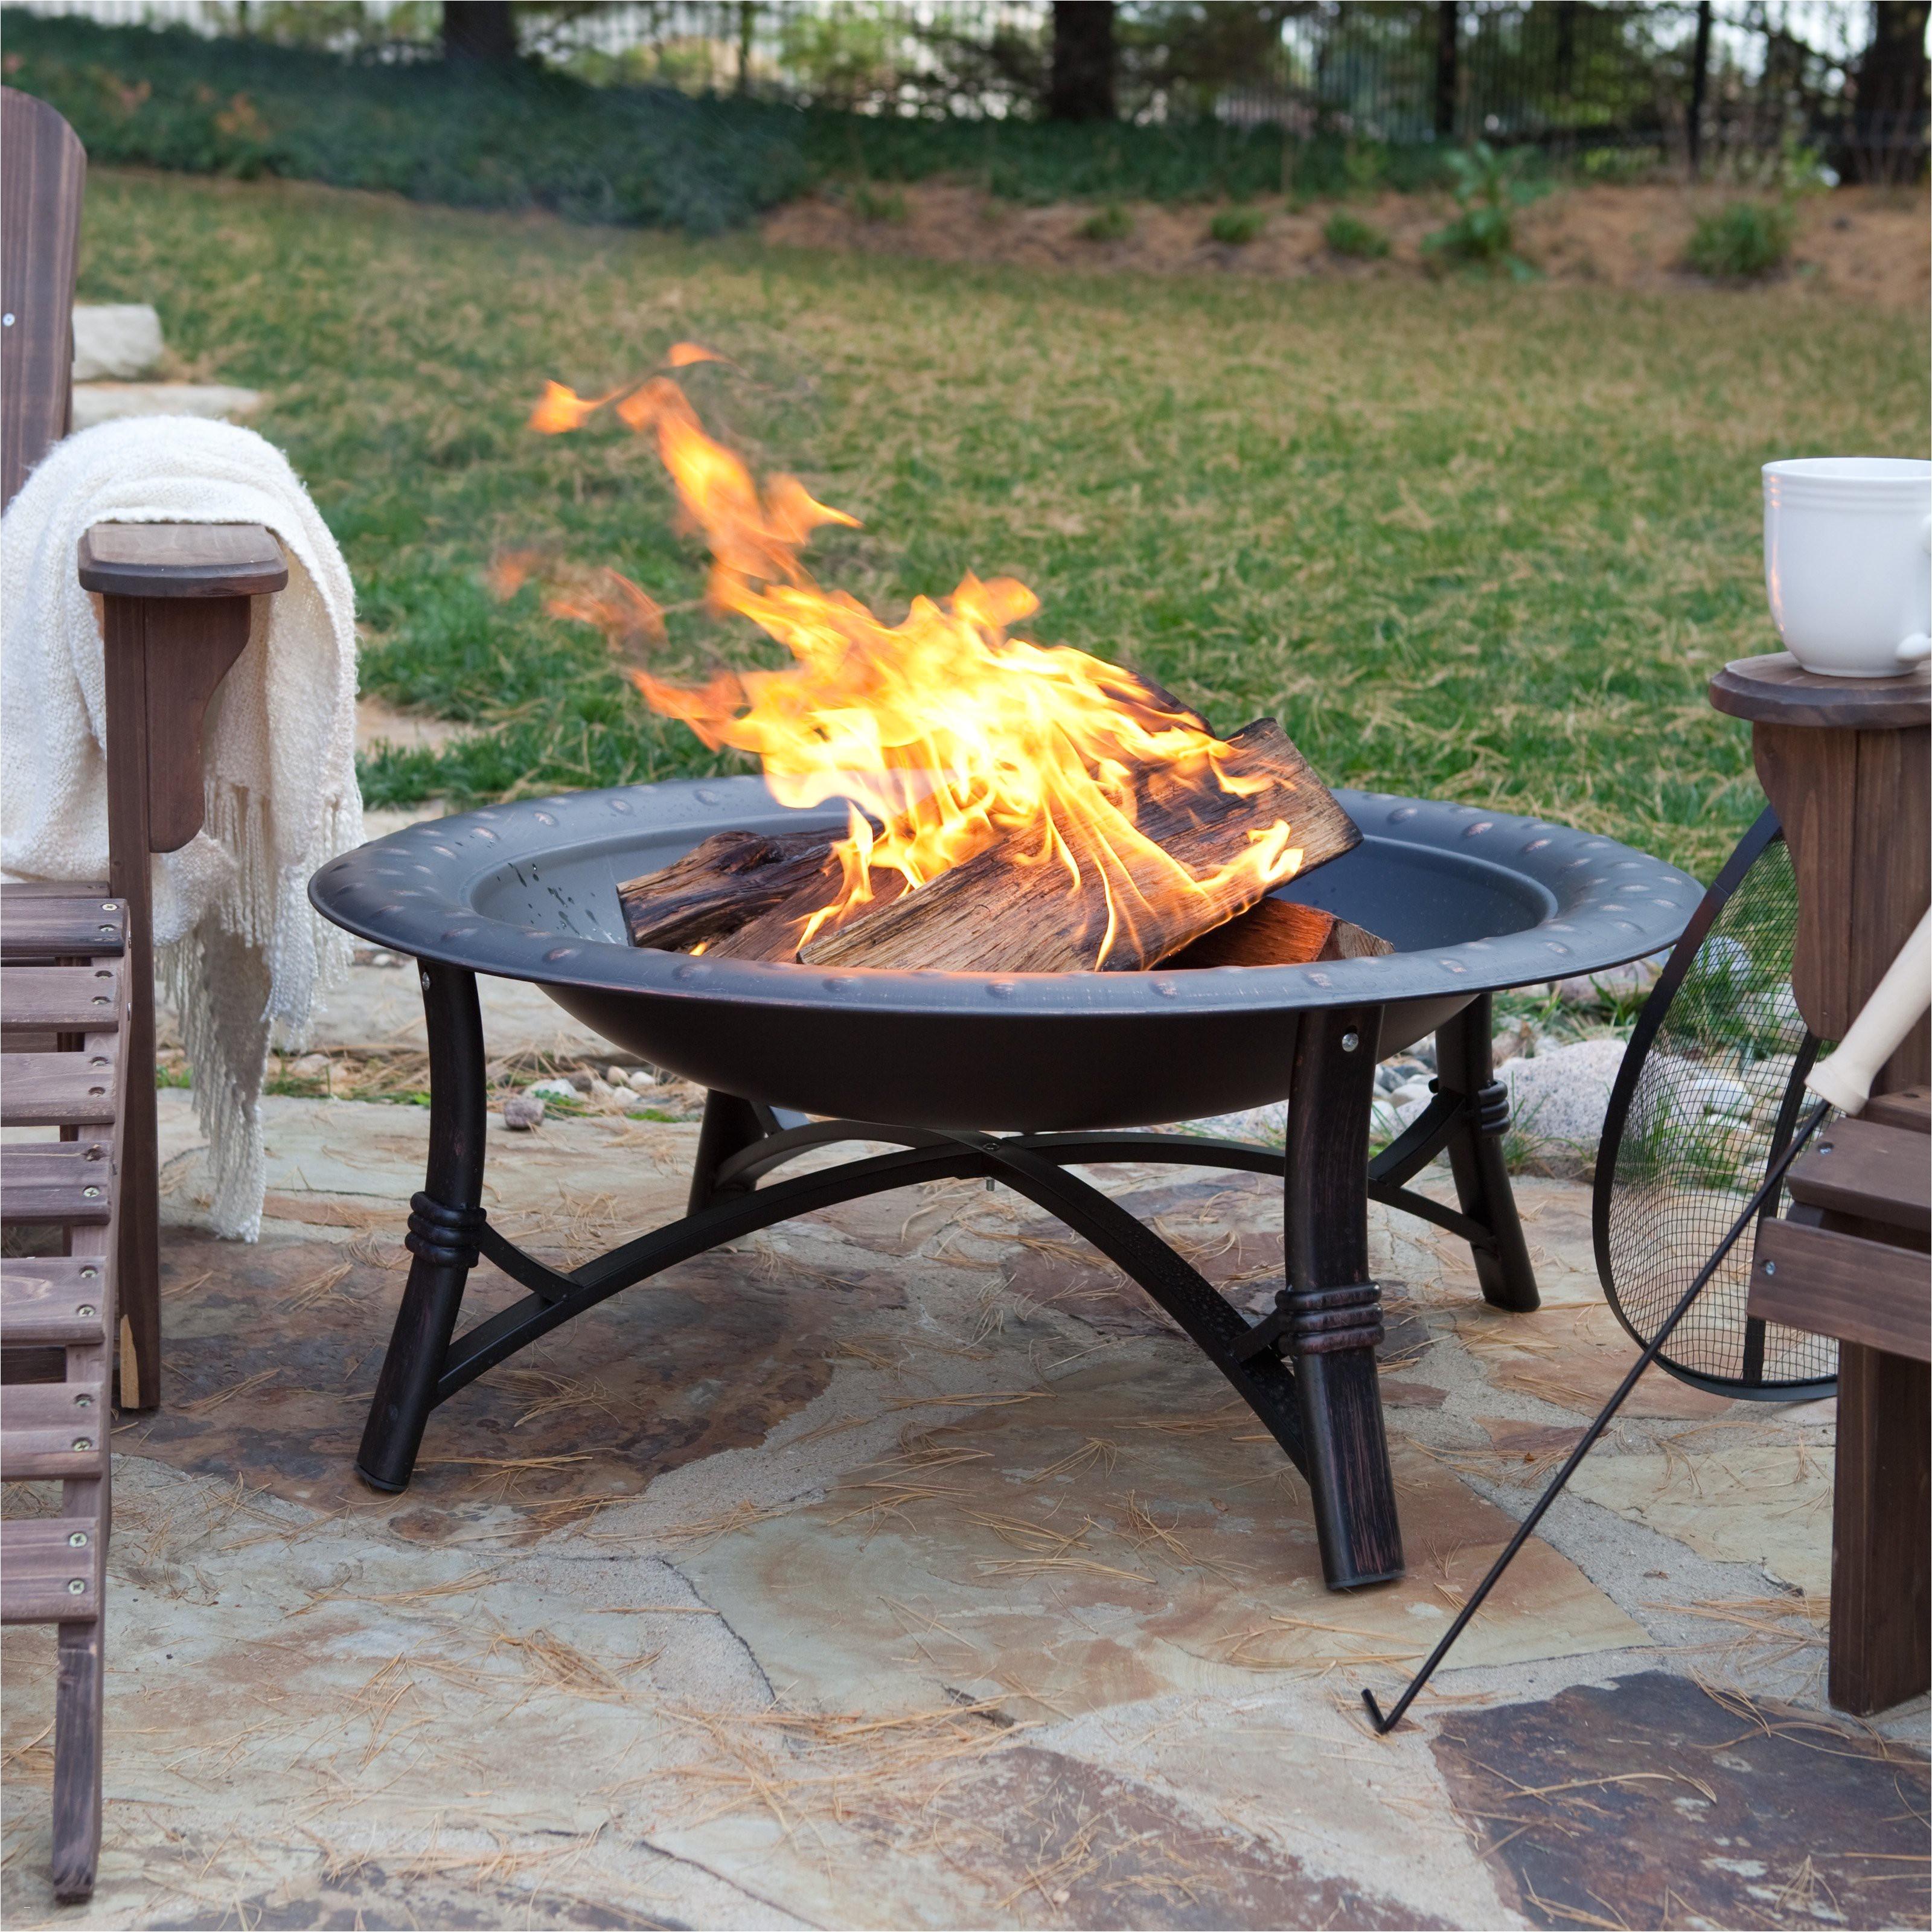 walmart outdoor gas fireplace unique walmart outdoor fireplace best new walmart outdoor fire pit